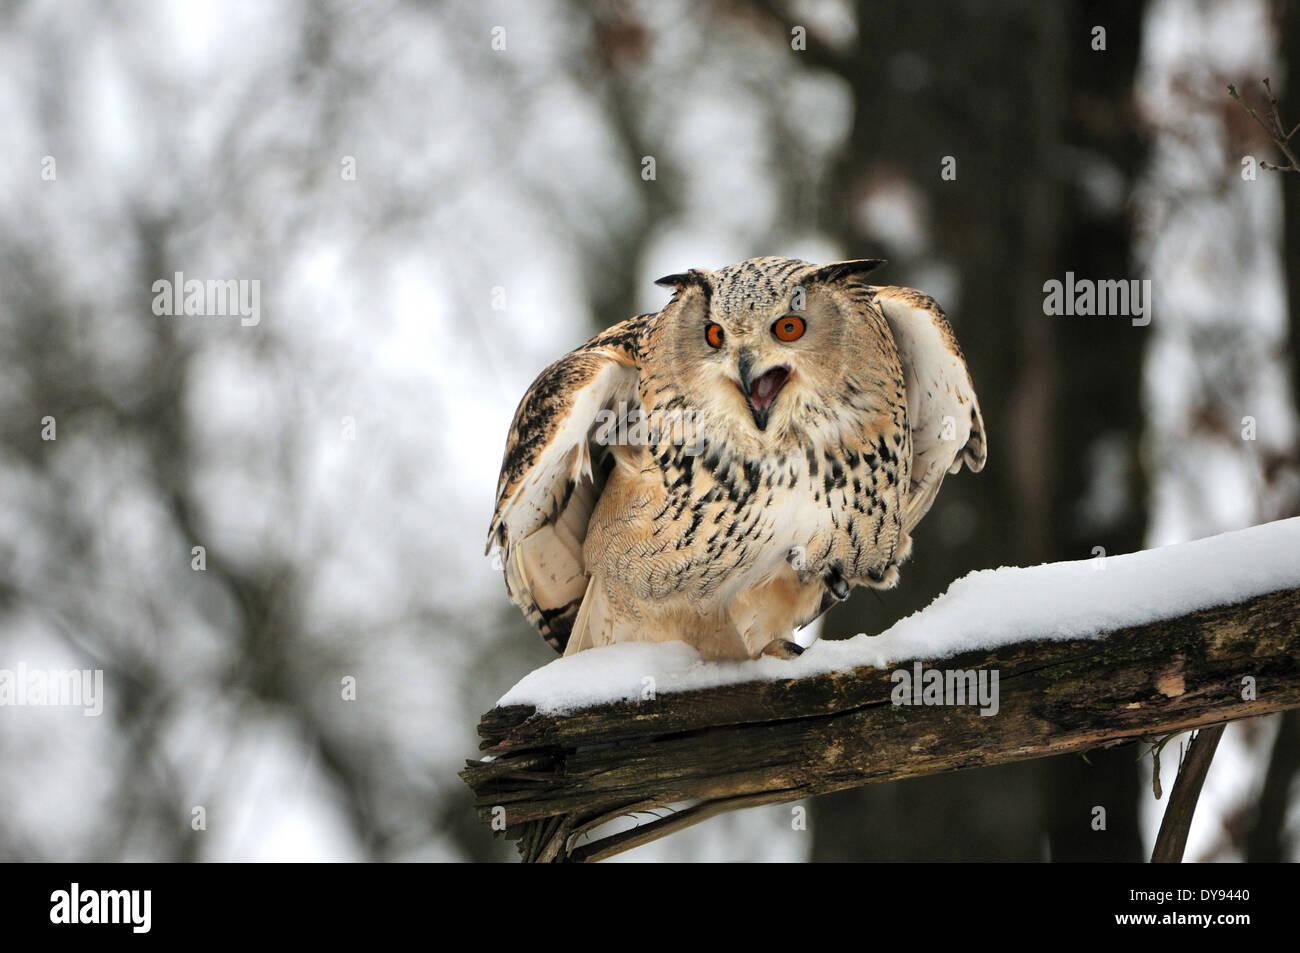 owl owls Siberian owl Bubo bubo sibiricus owls-like night birds of prey birds bird raptor animal animals Germany Europe, - Stock Image